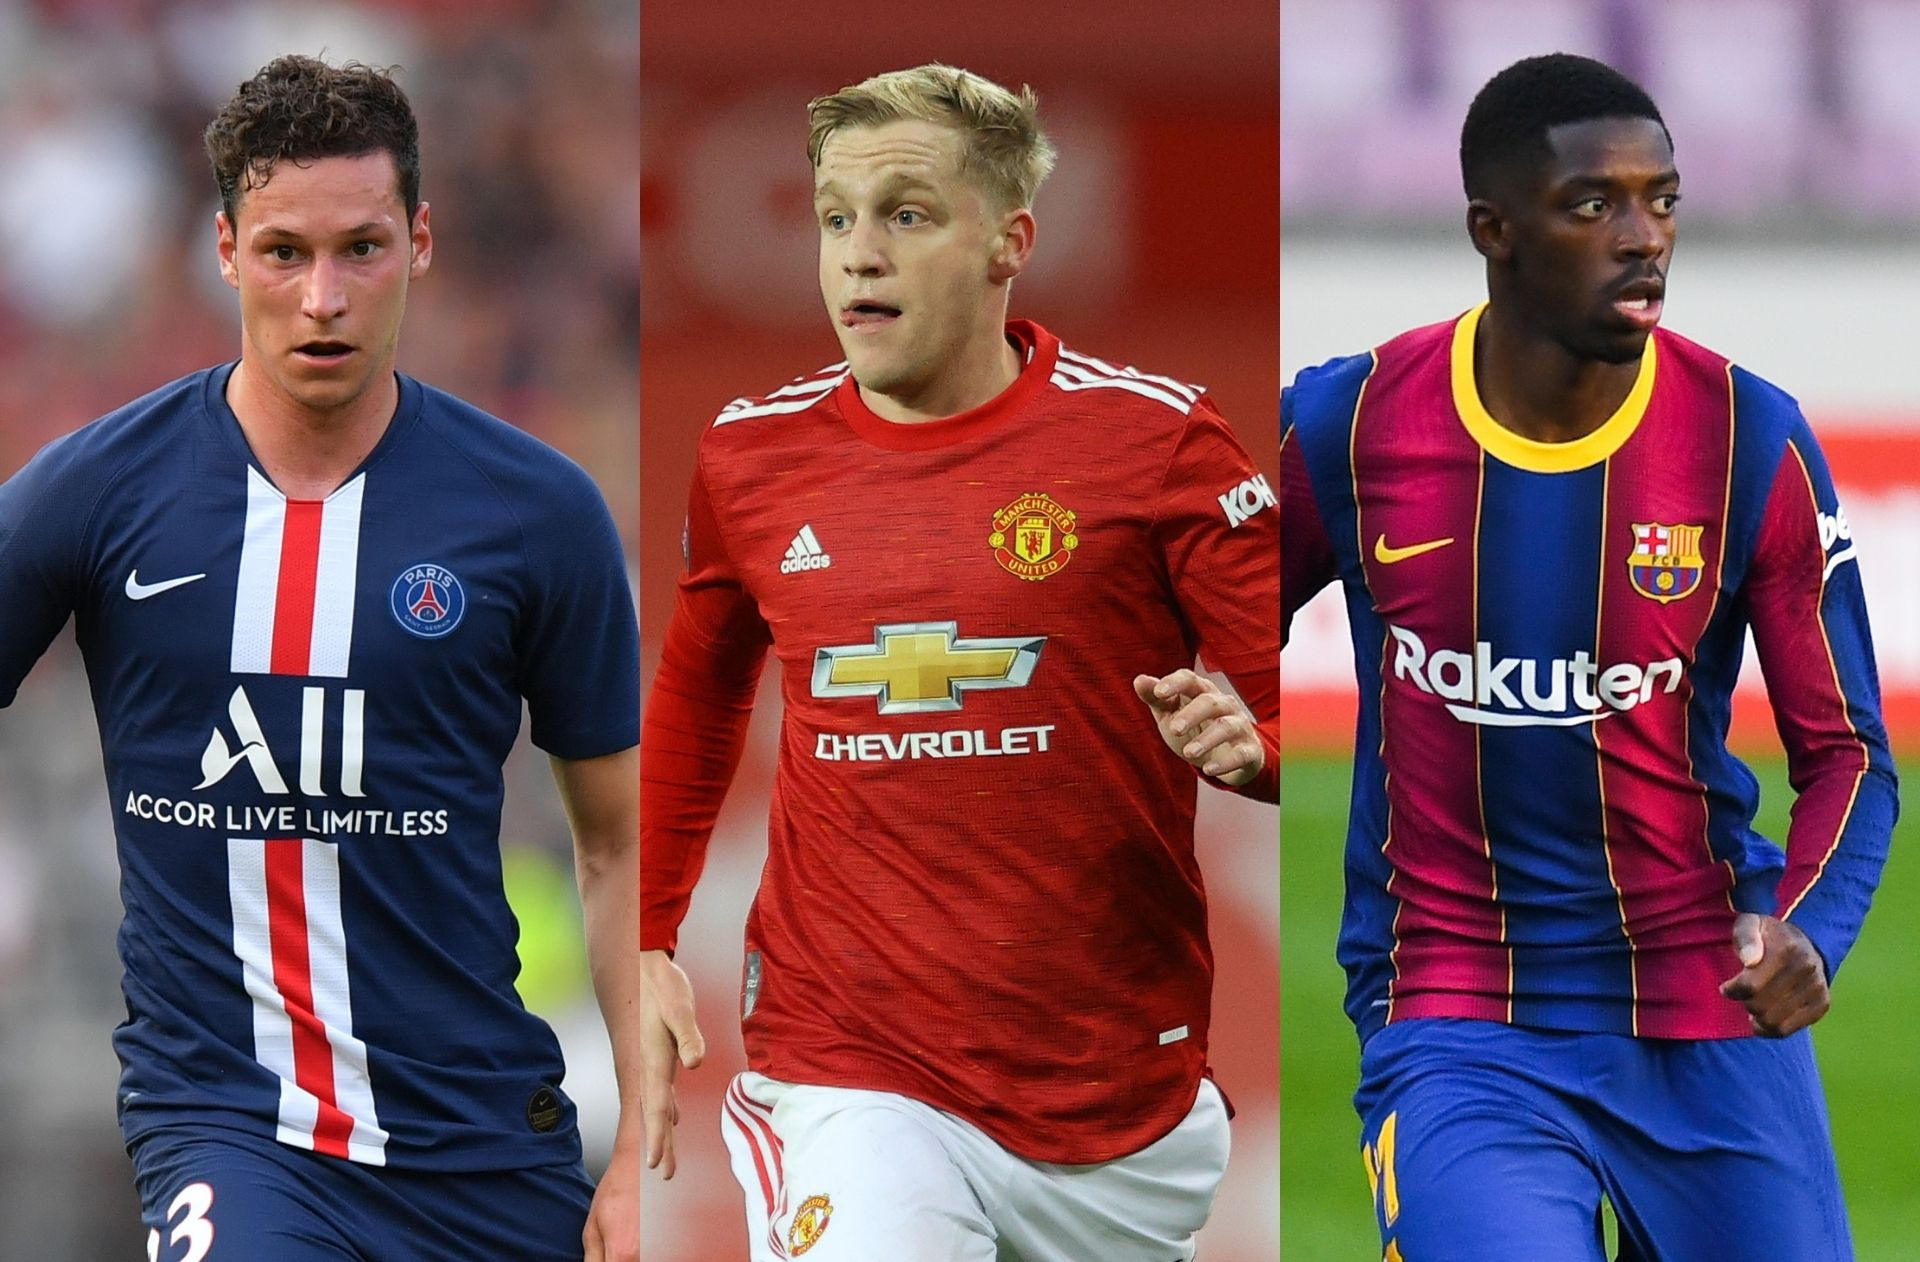 Julian Draxler of Paris Saint-Germain, Donny van de Beek of Manchester United, Ousmane Dembele of FC Barcelona